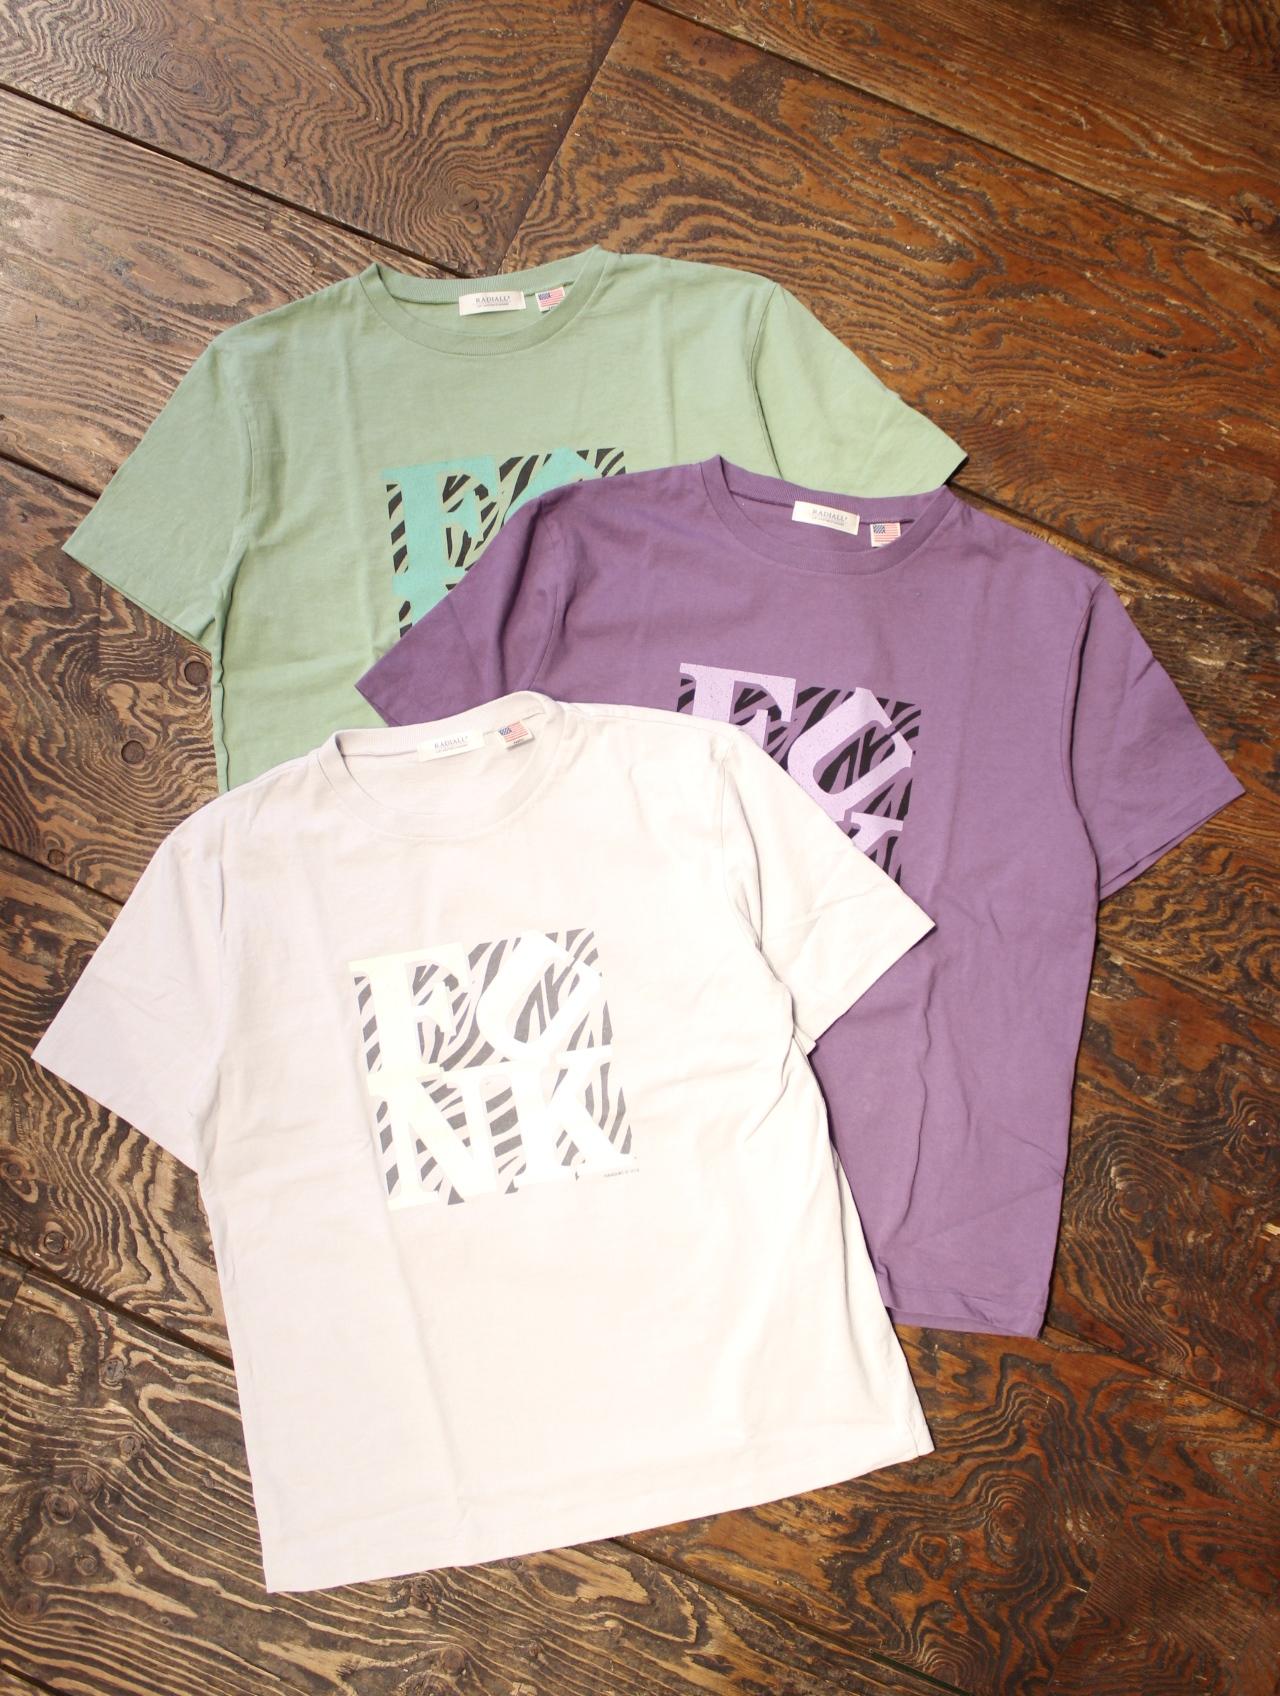 RADIALL  「KNAP TOWN - CREW NECK T-SHIRT」 プリントティーシャツ